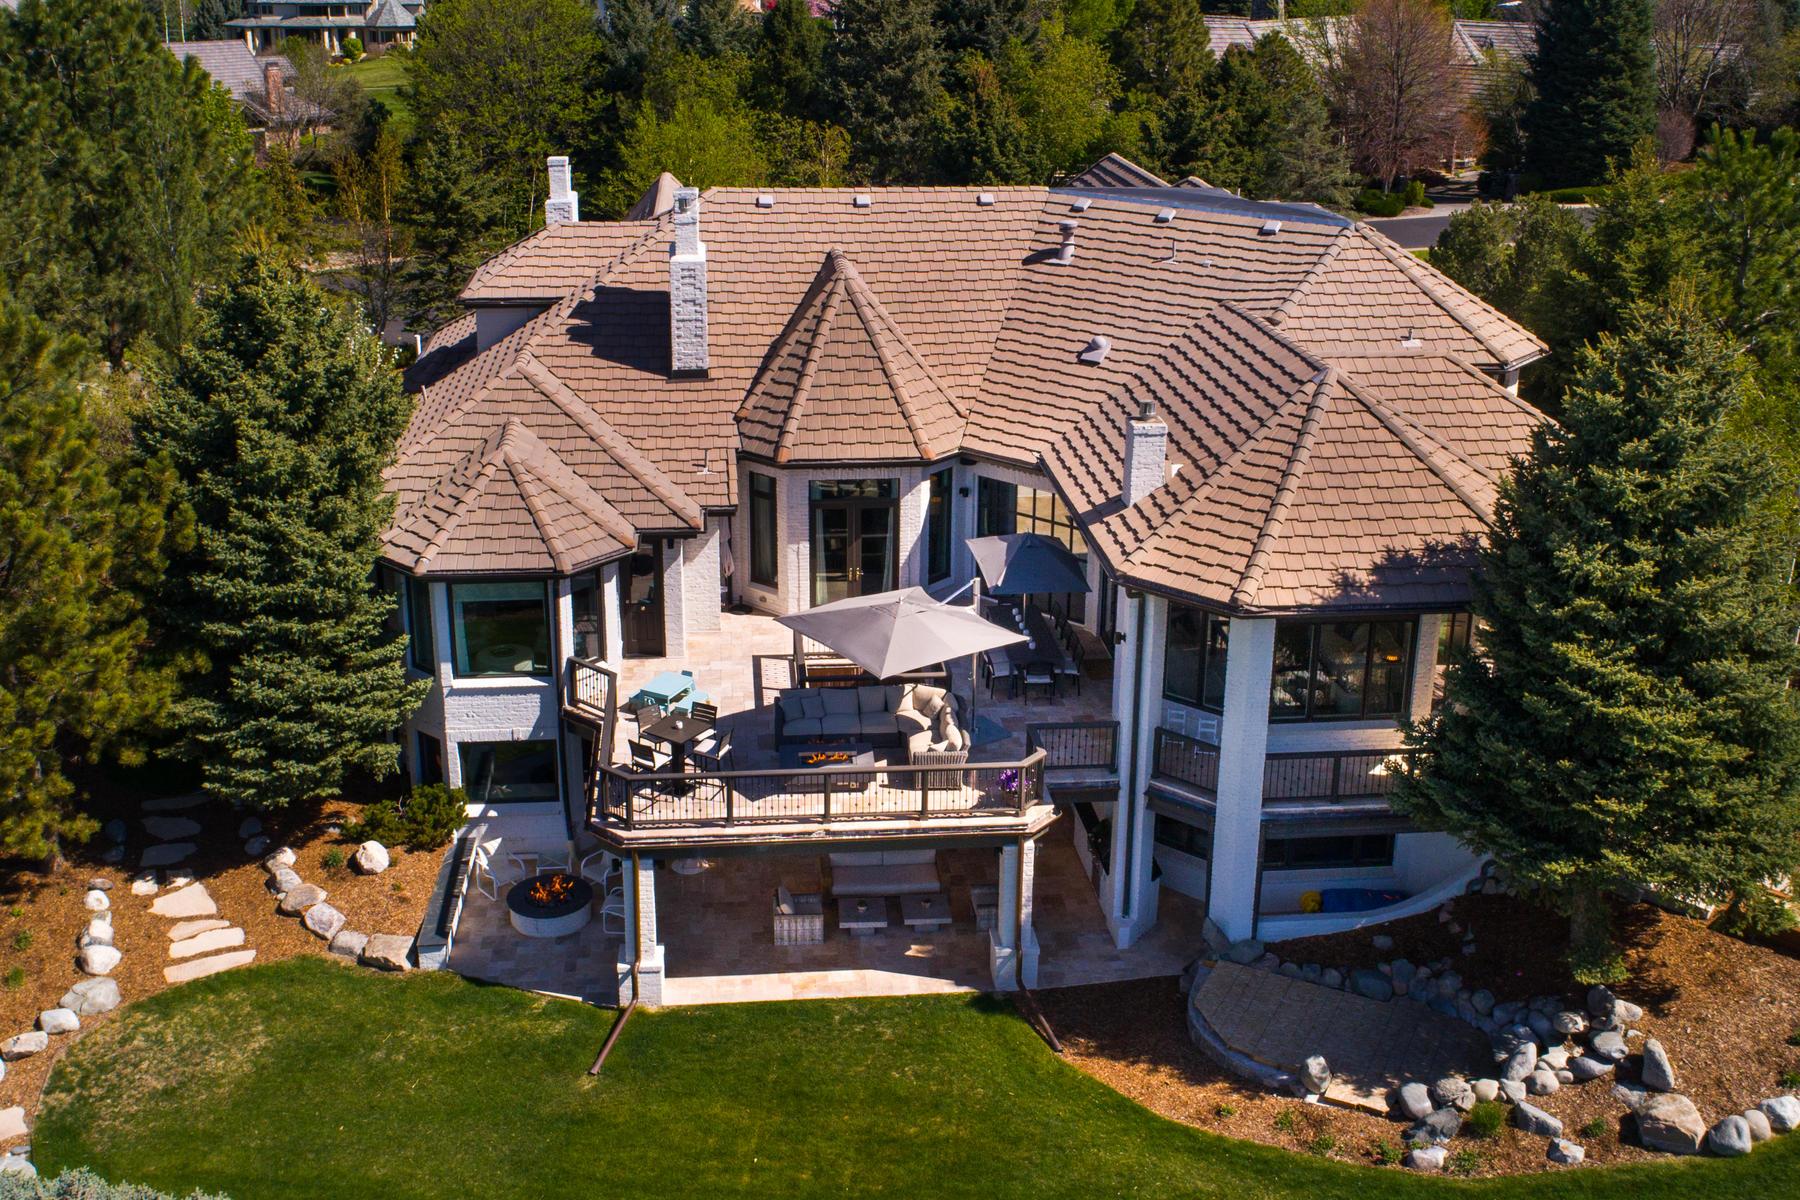 Casa Unifamiliar por un Venta en Timeless Beauty and Captivating Mountain Views 89 Glenmoor Place Cherry Hills Village, Colorado 80113 Estados Unidos